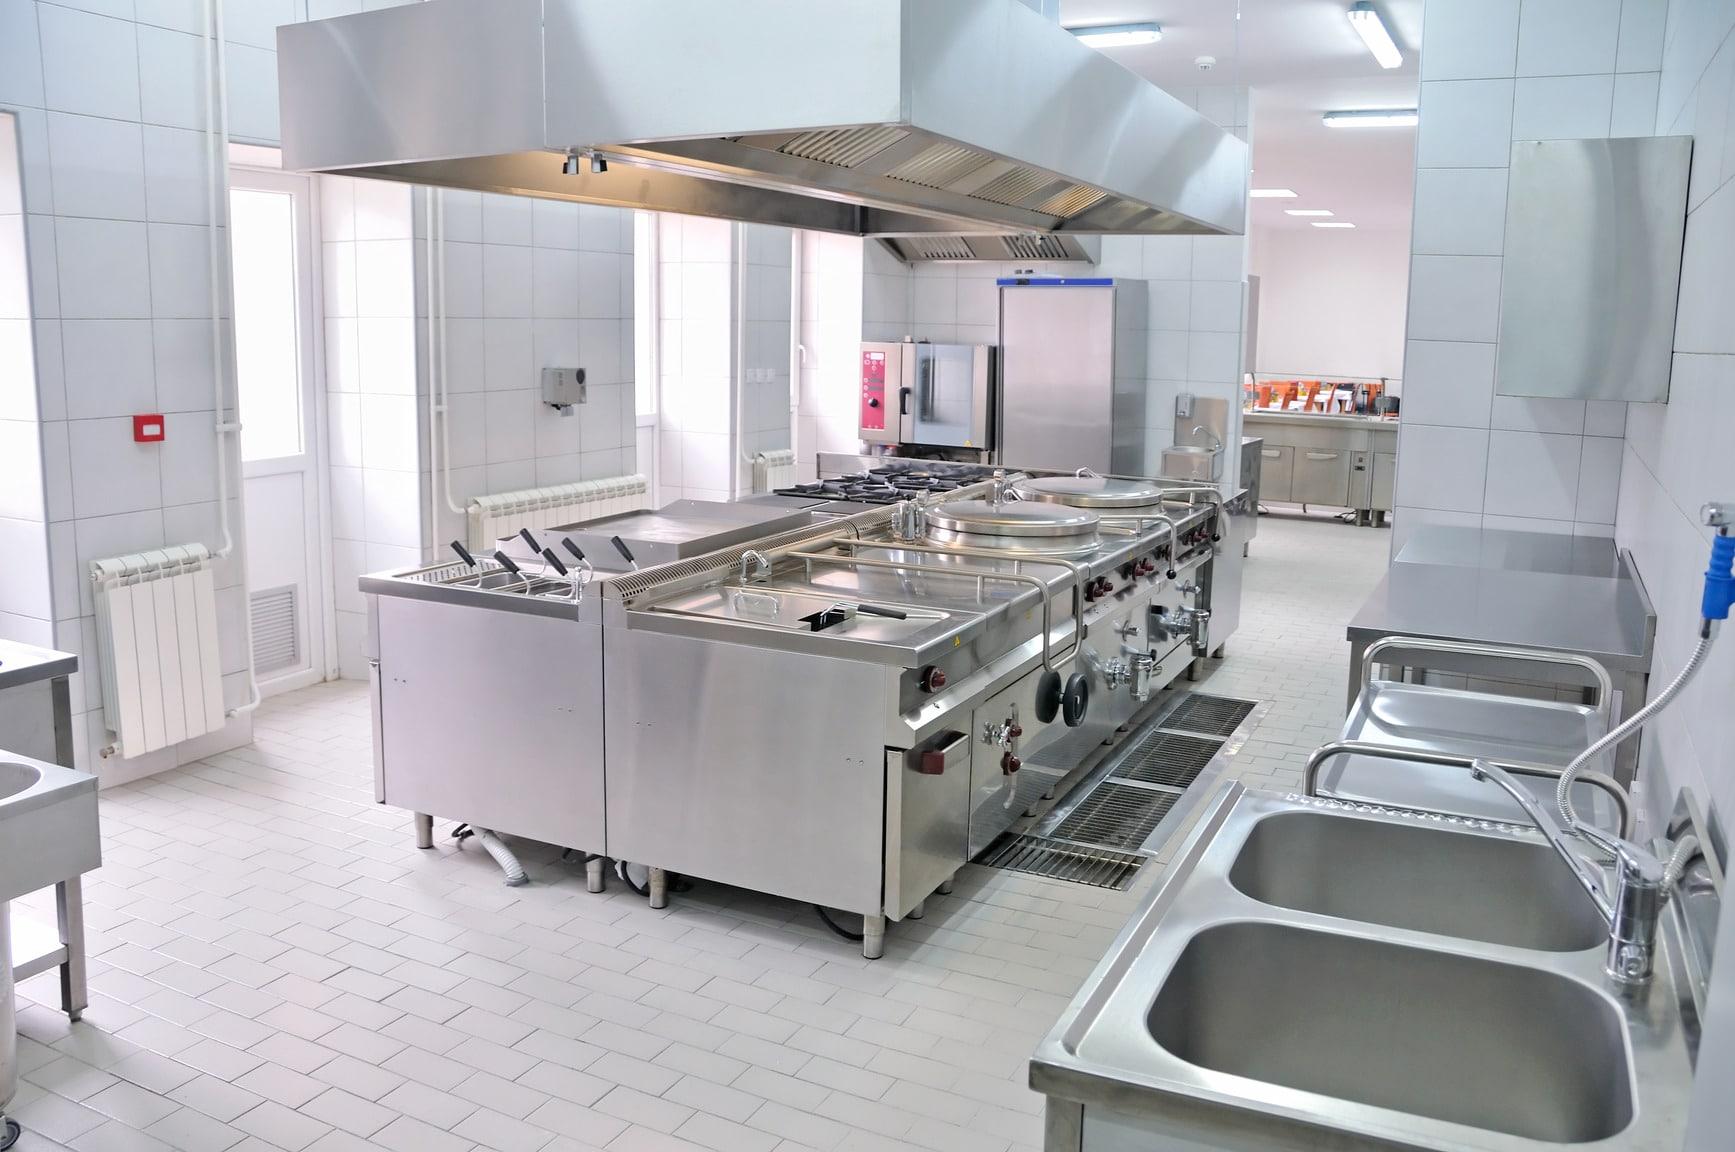 photodune-7602743-professional-kitchen-interior-m1